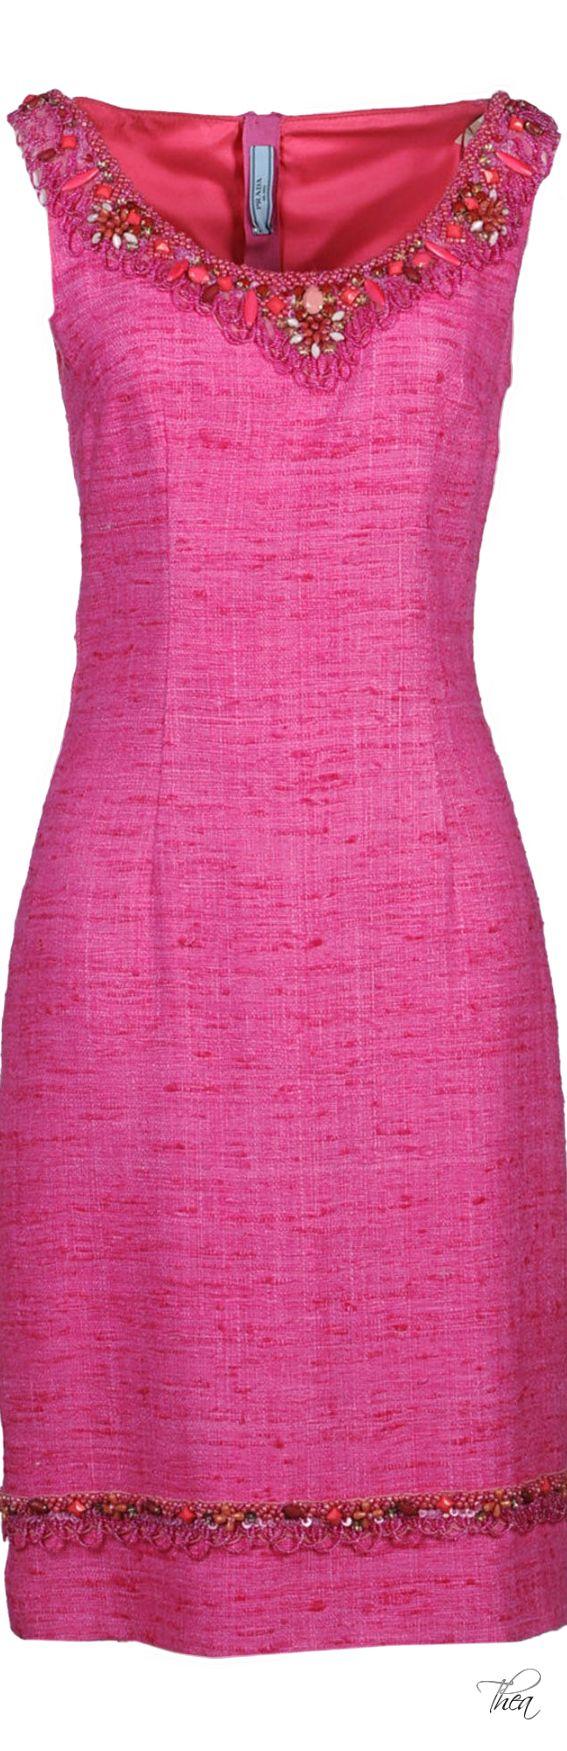 Prada ● Pink Dress